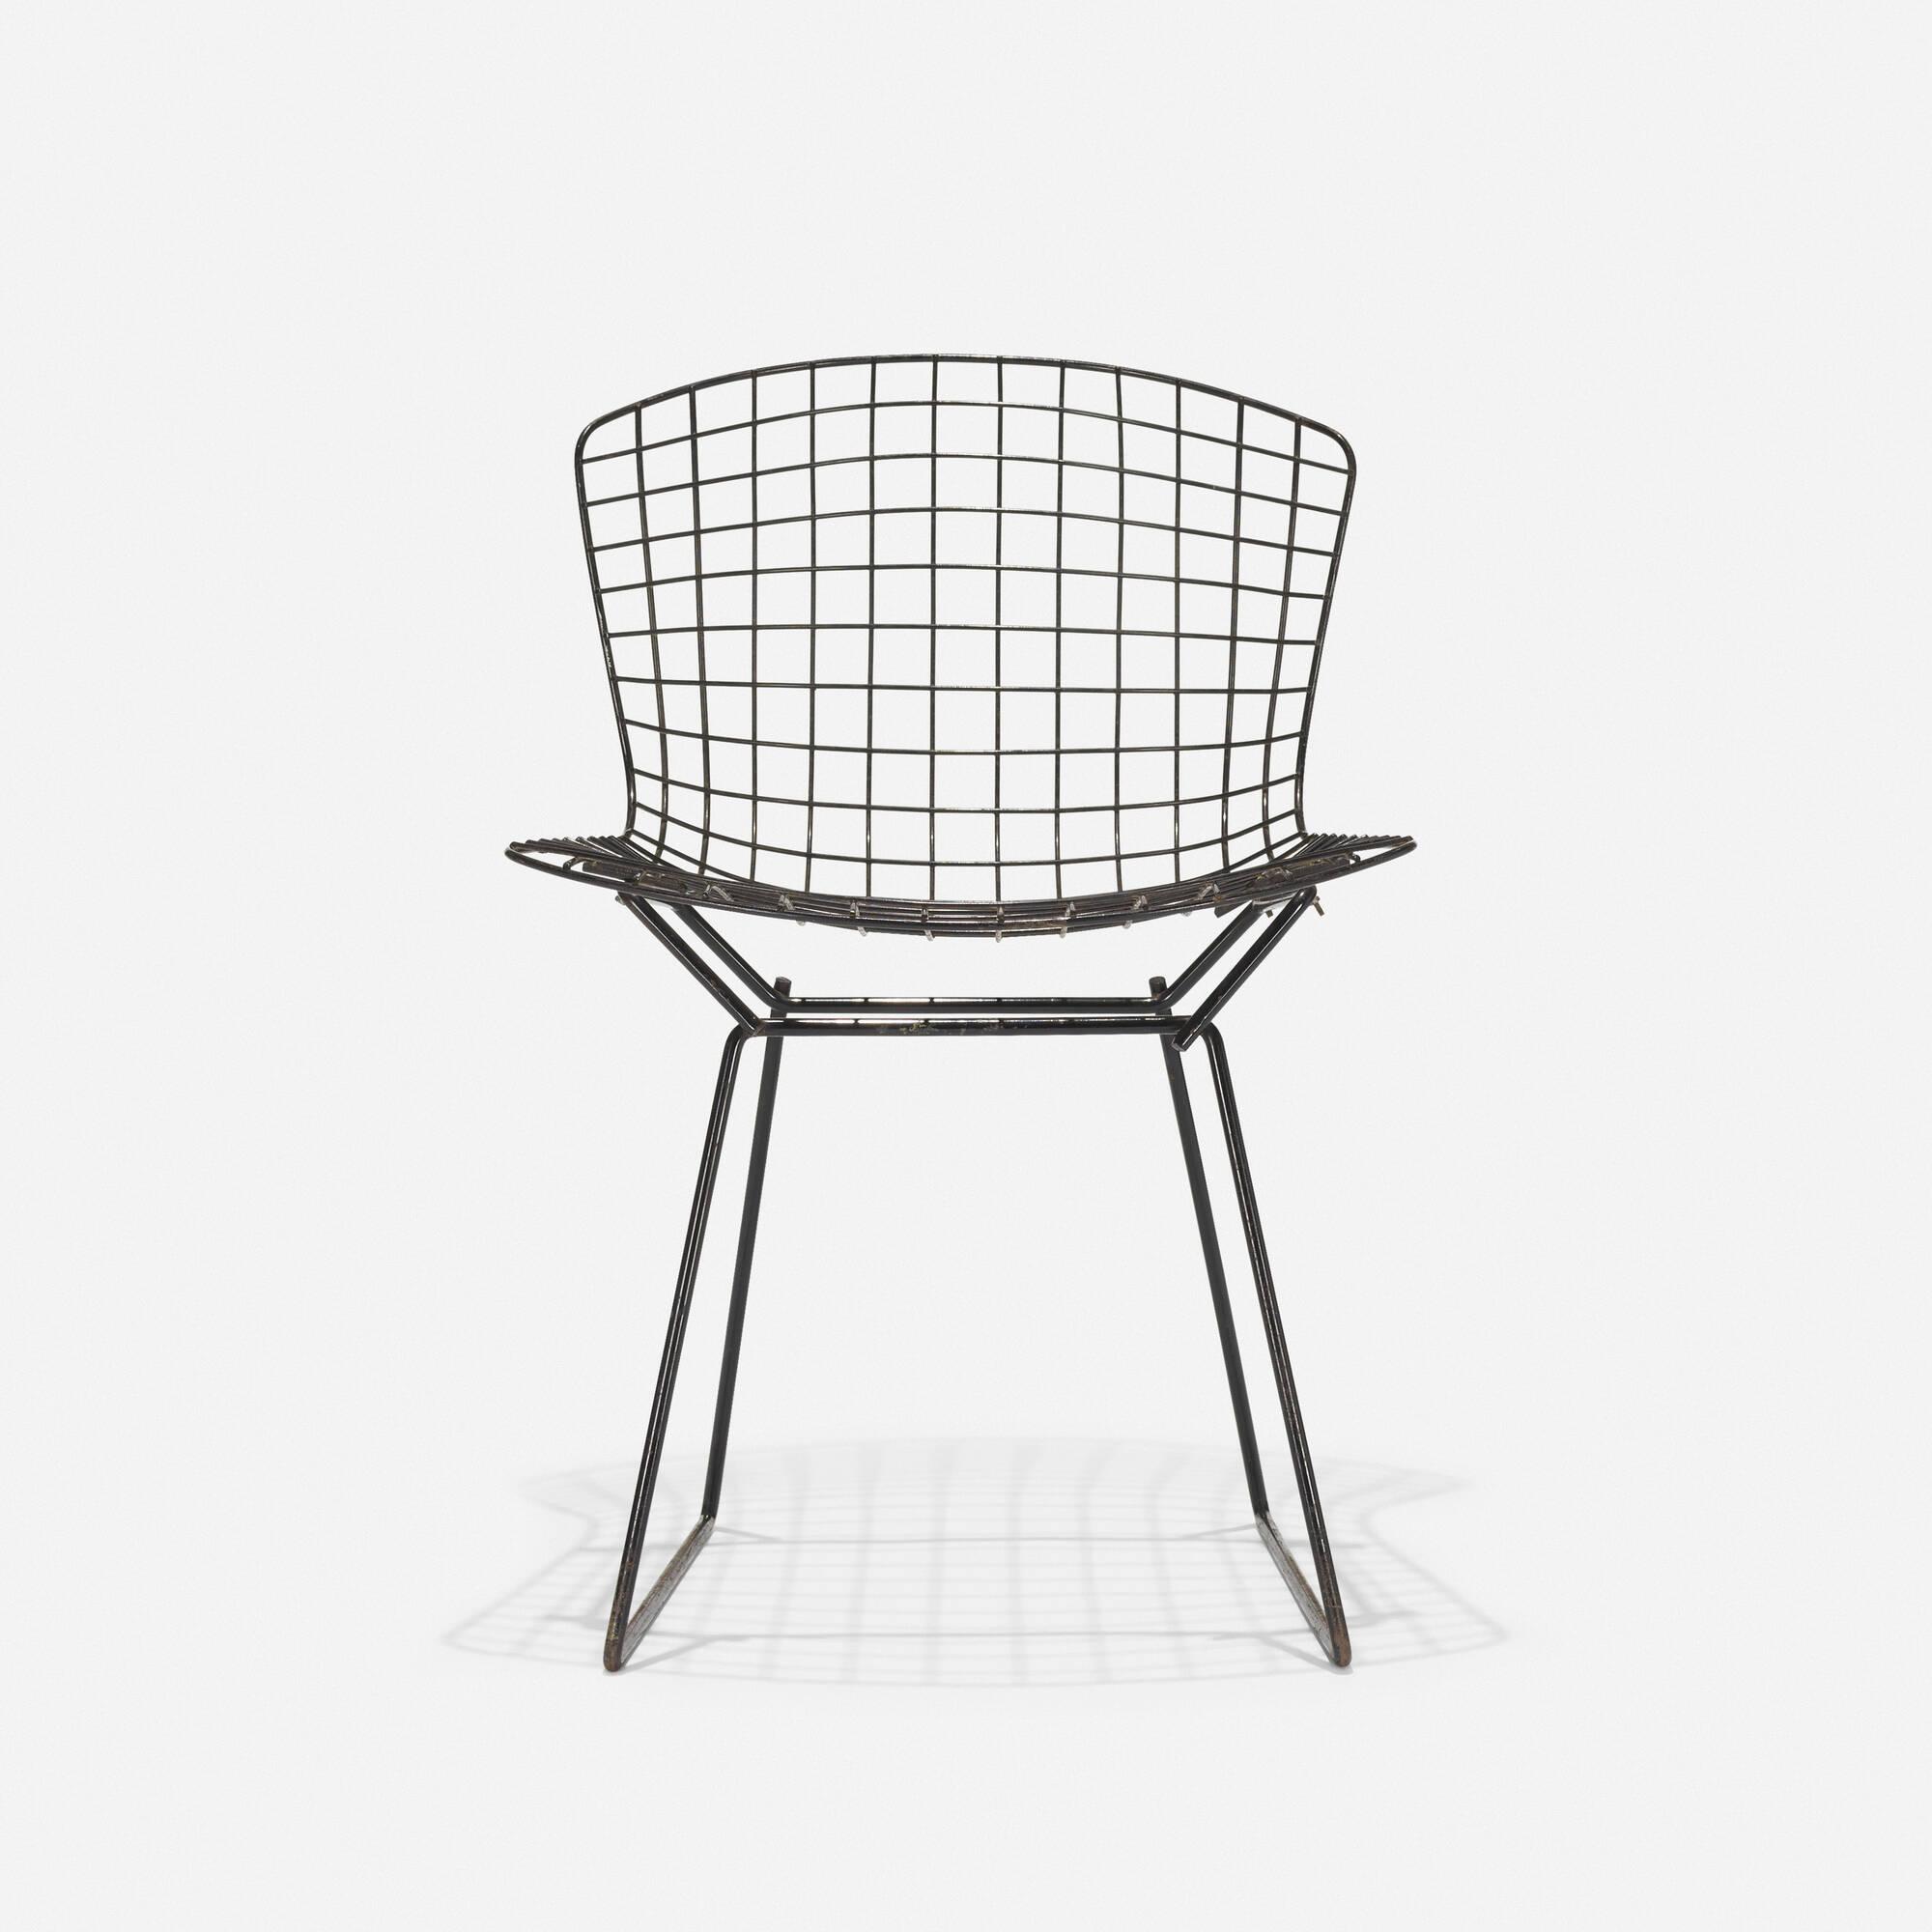 223: Harry Bertoia / chair (1 of 3)